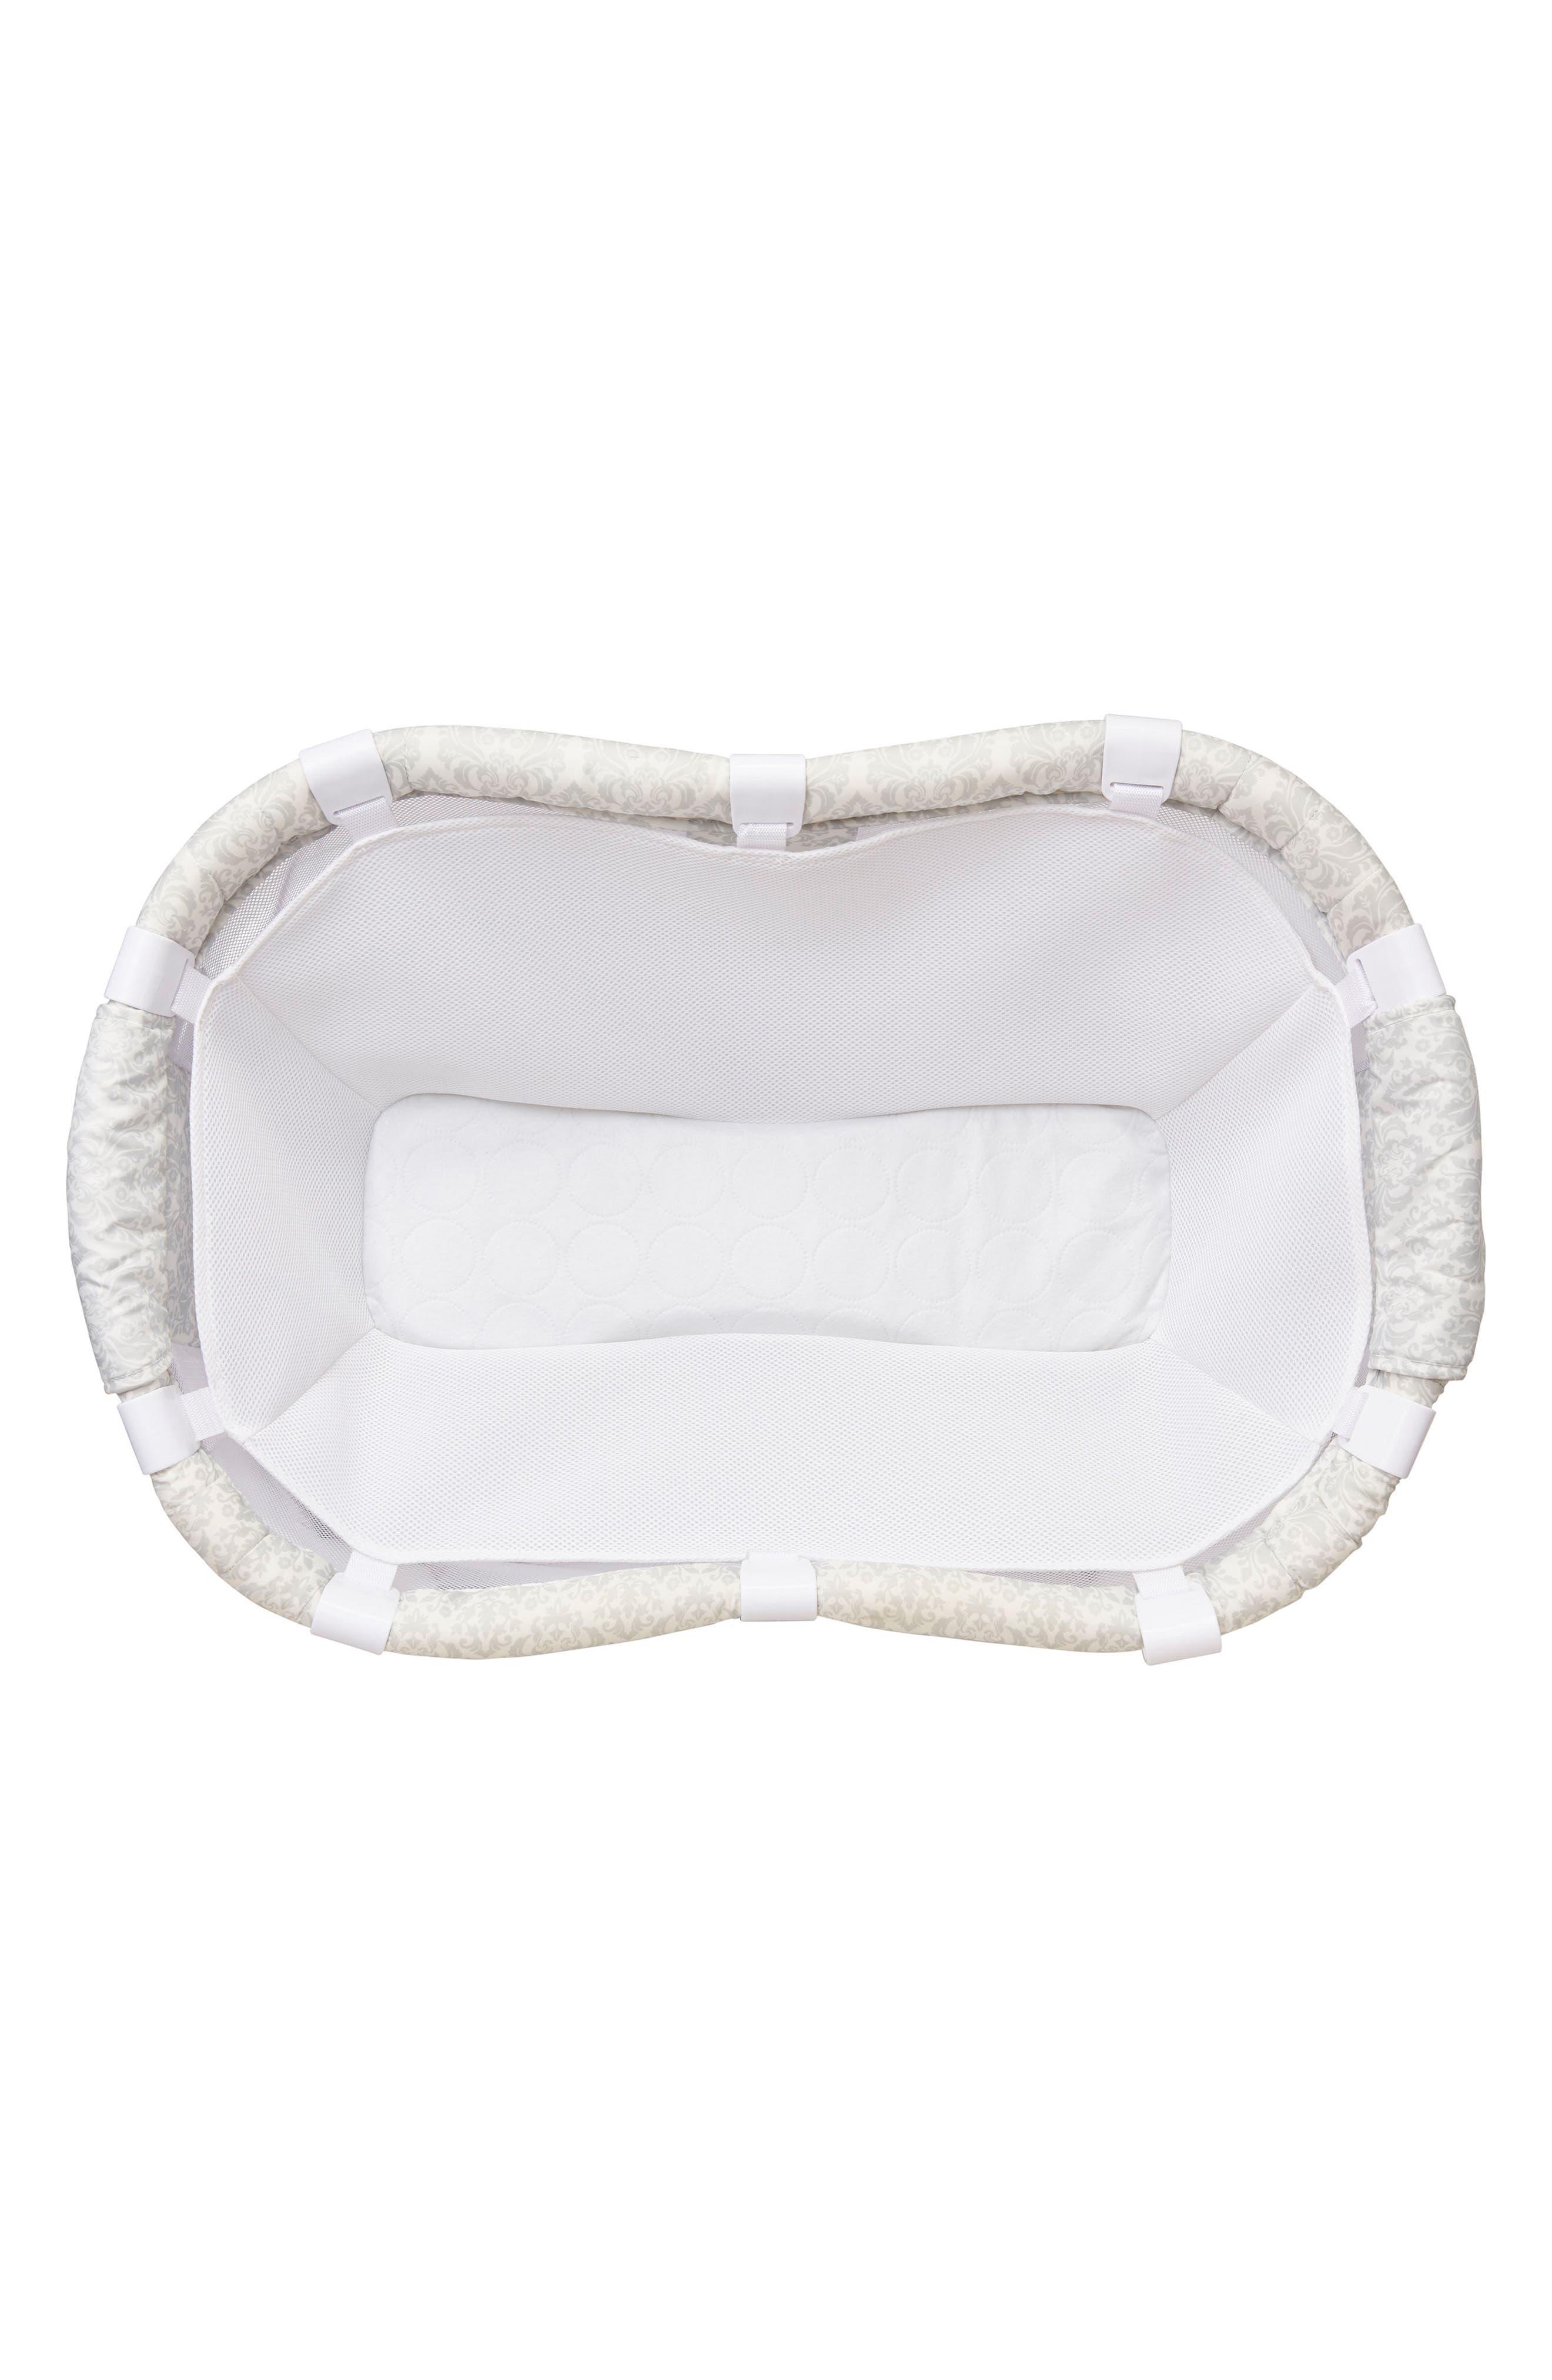 Newborn Cuddle Insert for Bassinest<sup>™</sup> Bedside Swivel Sleeper,                             Alternate thumbnail 3, color,                             White Mesh